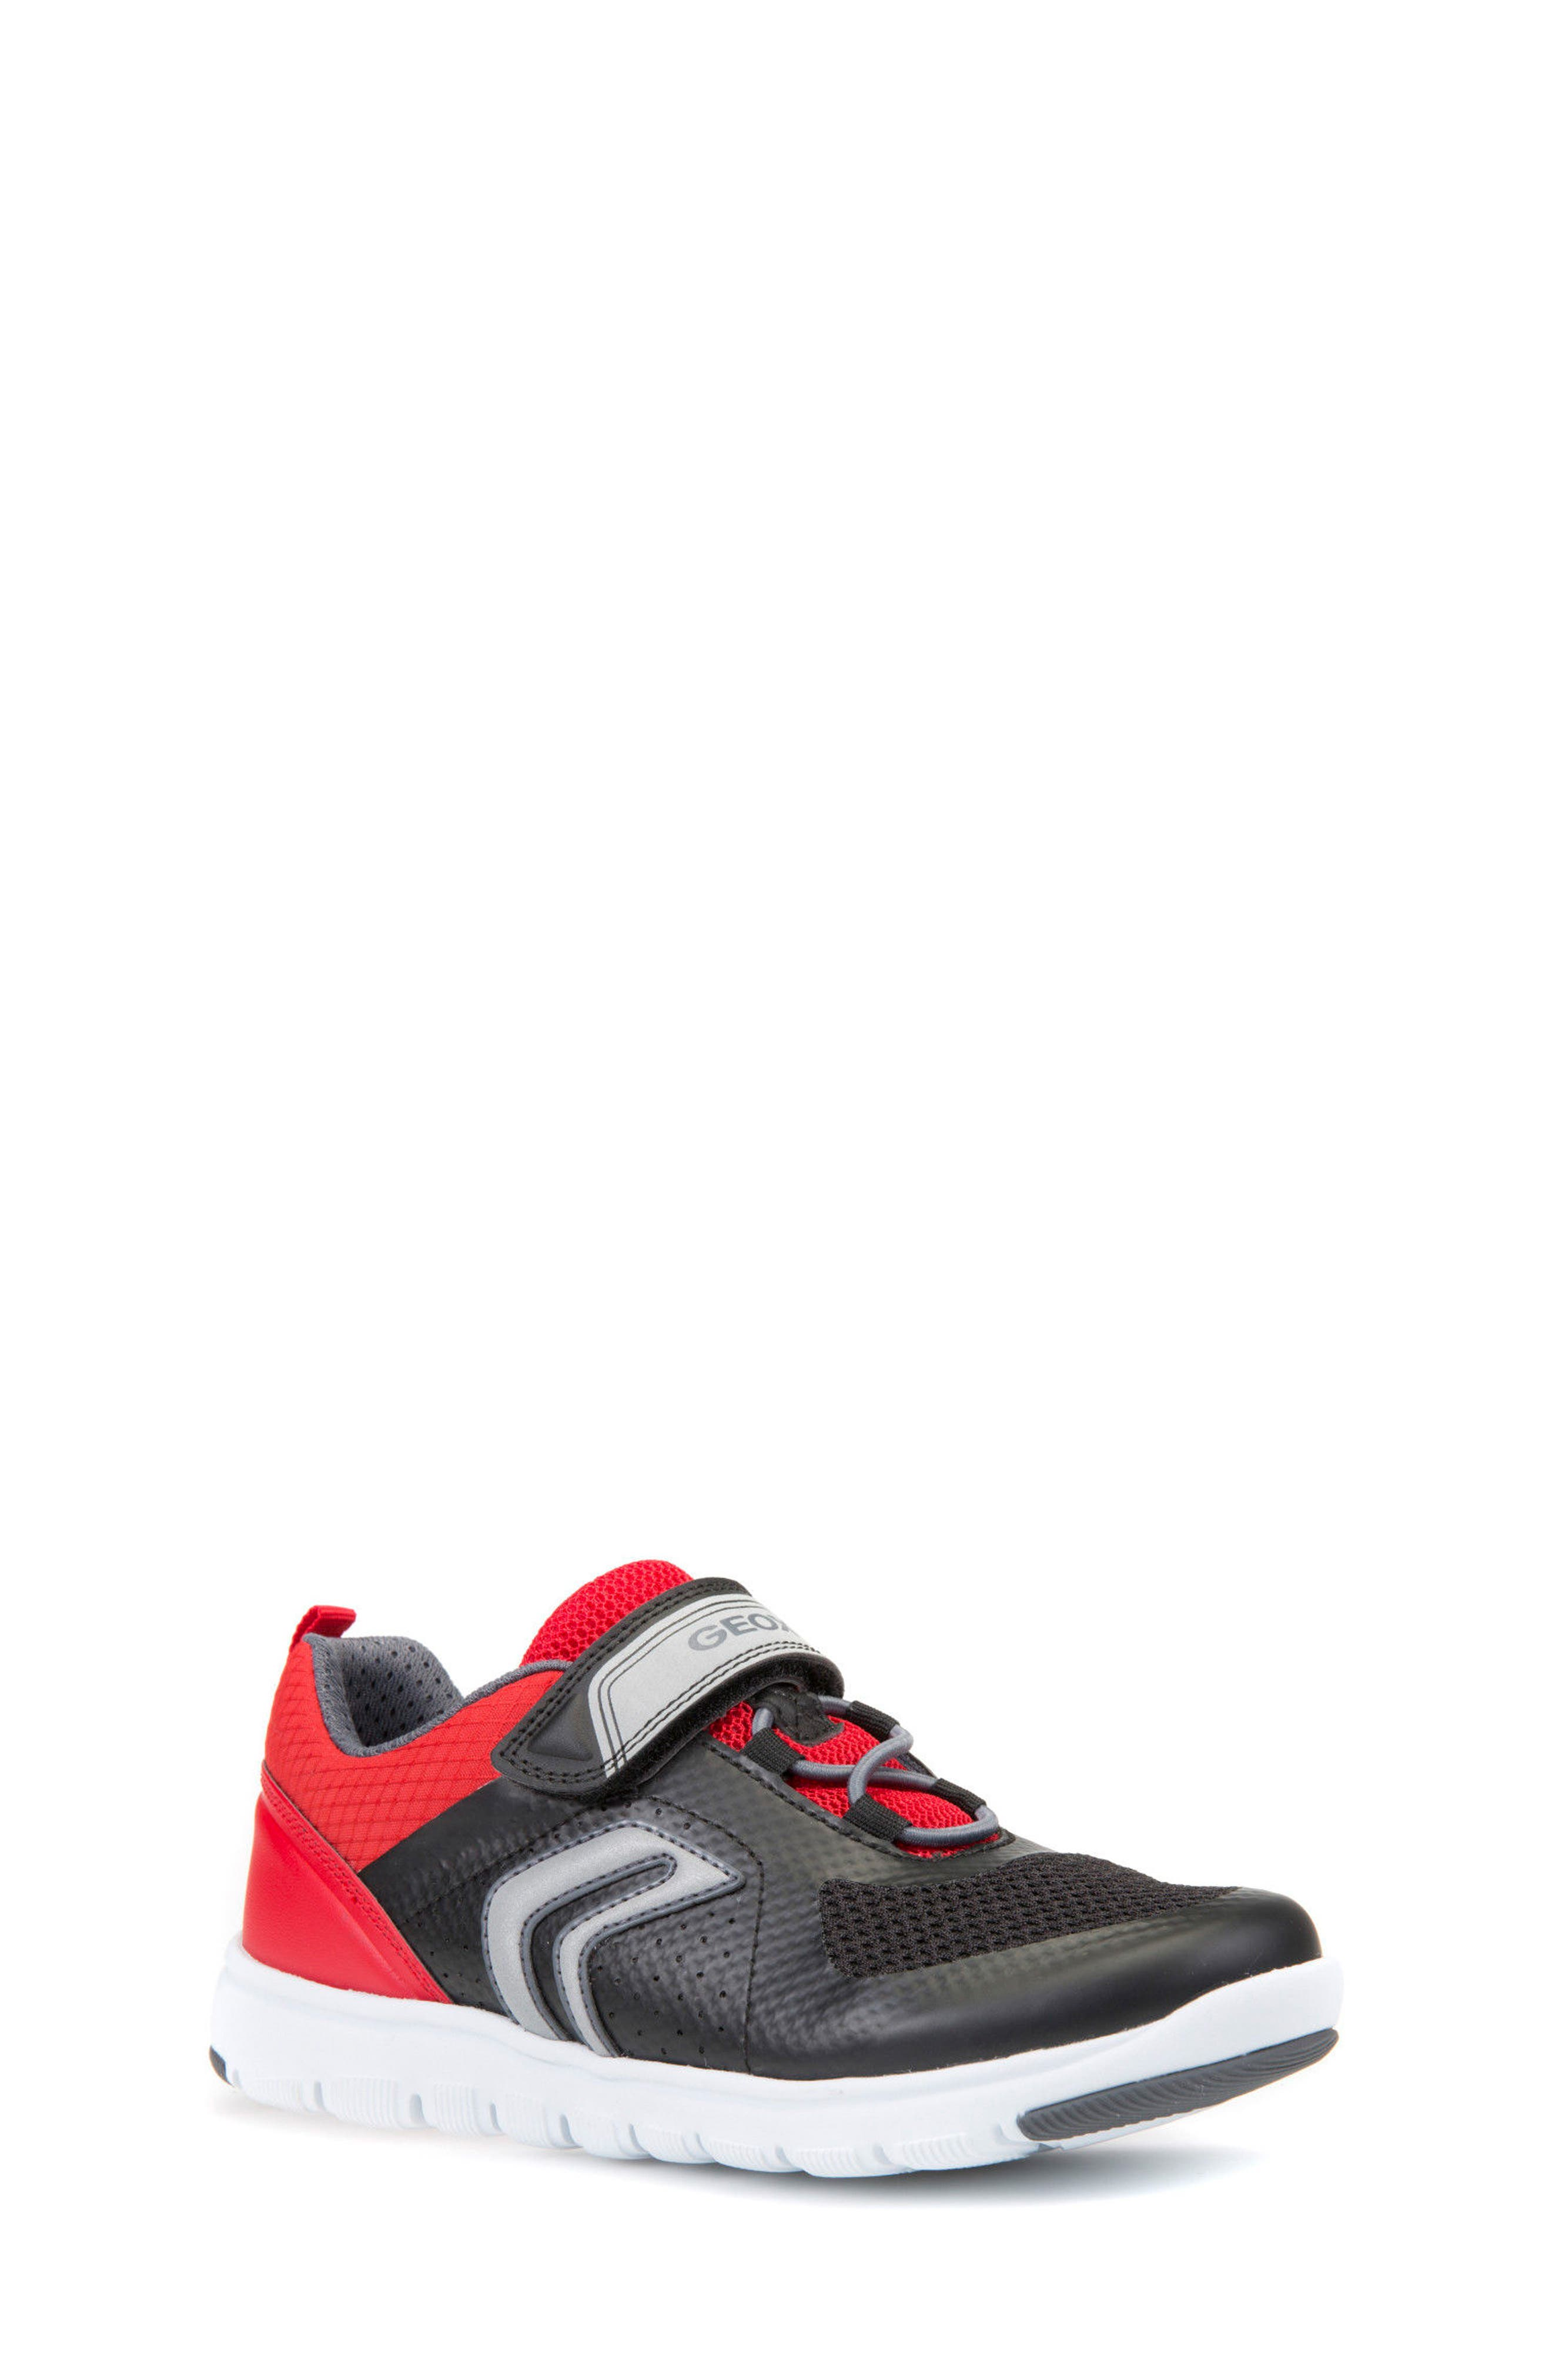 Xunday Low Top Sneaker,                             Main thumbnail 1, color,                             001